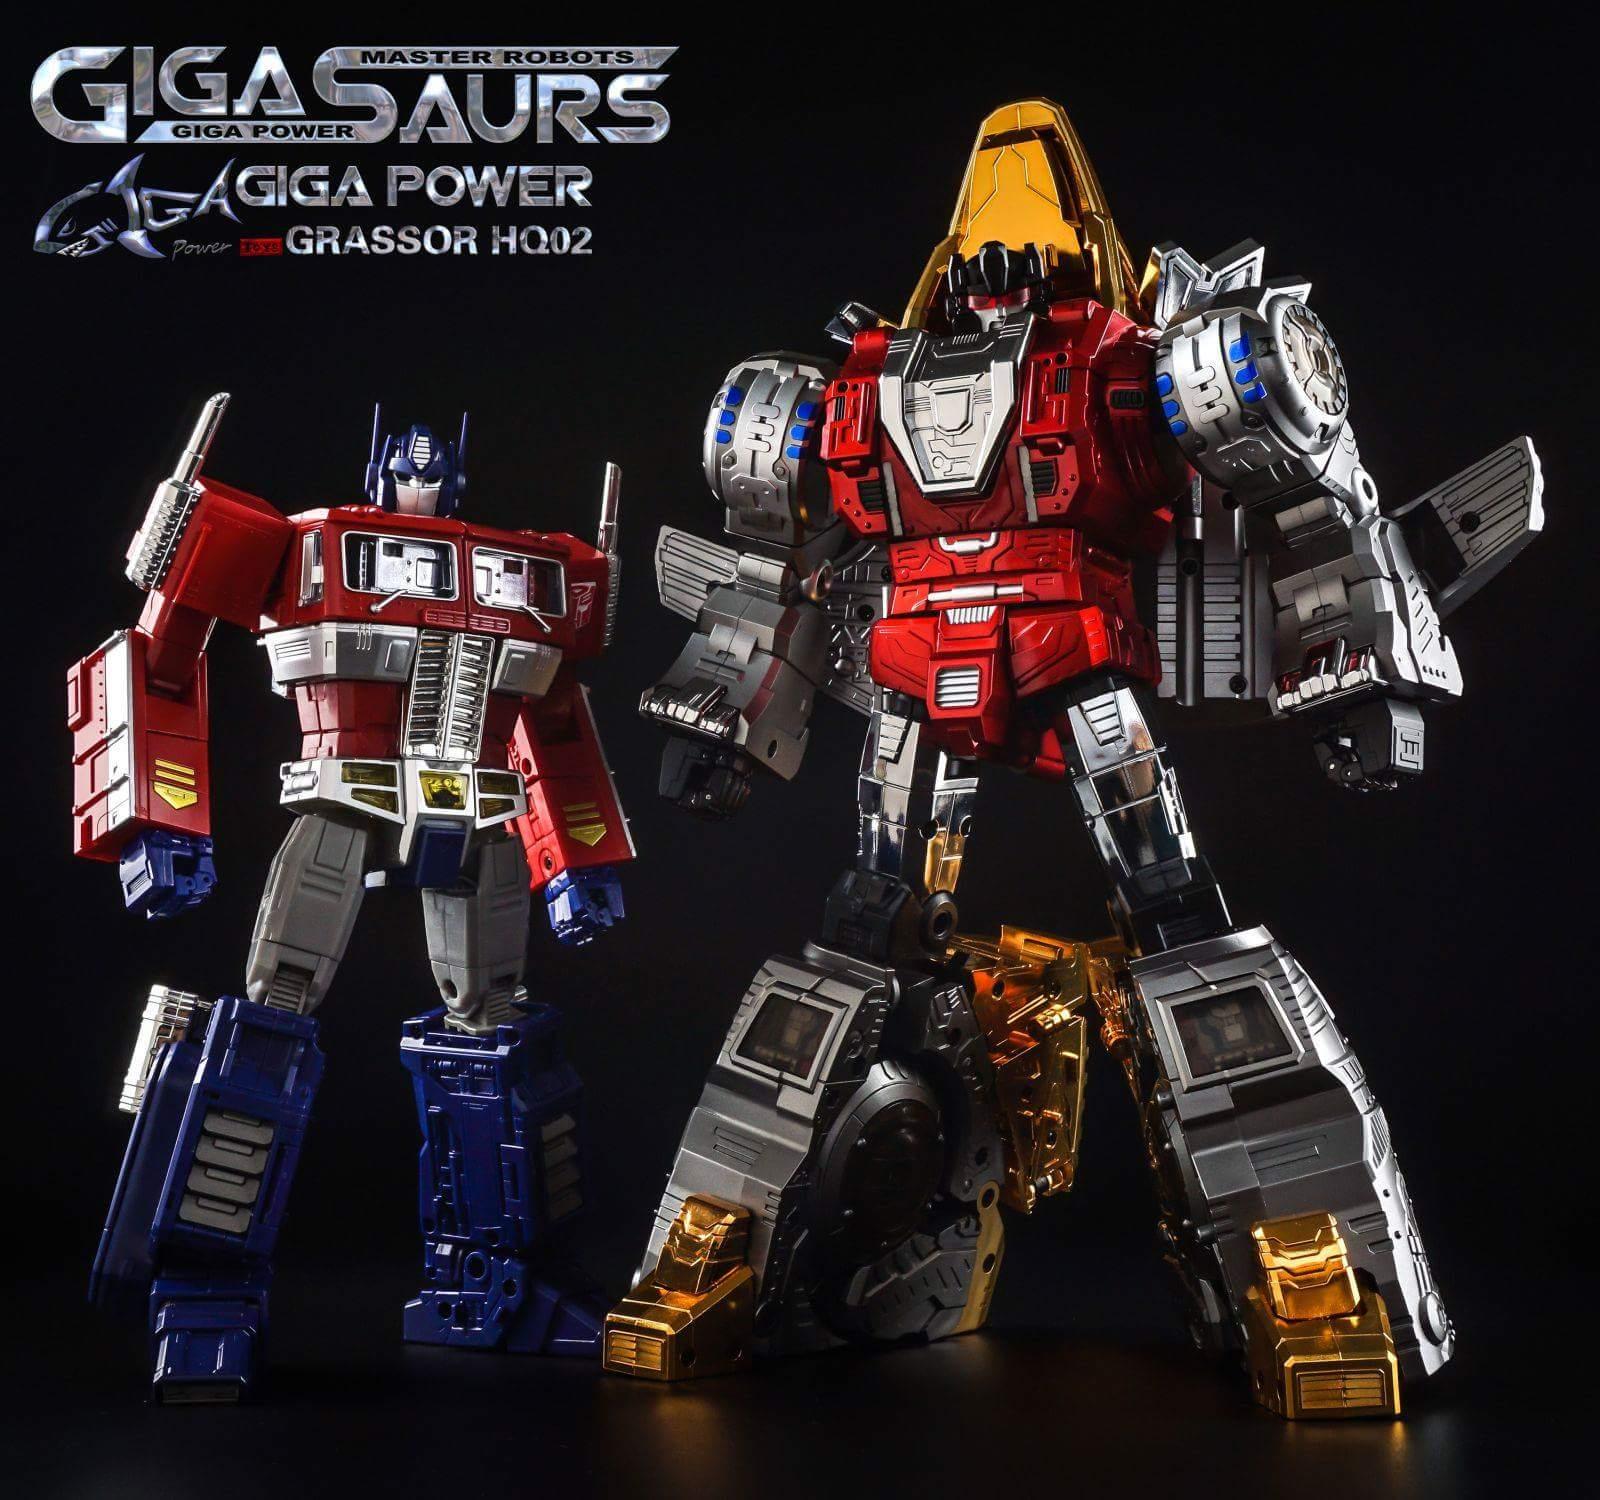 [GigaPower] Produit Tiers - Jouets HQ-01 Superator + HQ-02 Grassor + HQ-03 Guttur + HQ-04 Graviter + HQ-05 Gaudenter - aka Dinobots - Page 4 4MNBhFMr